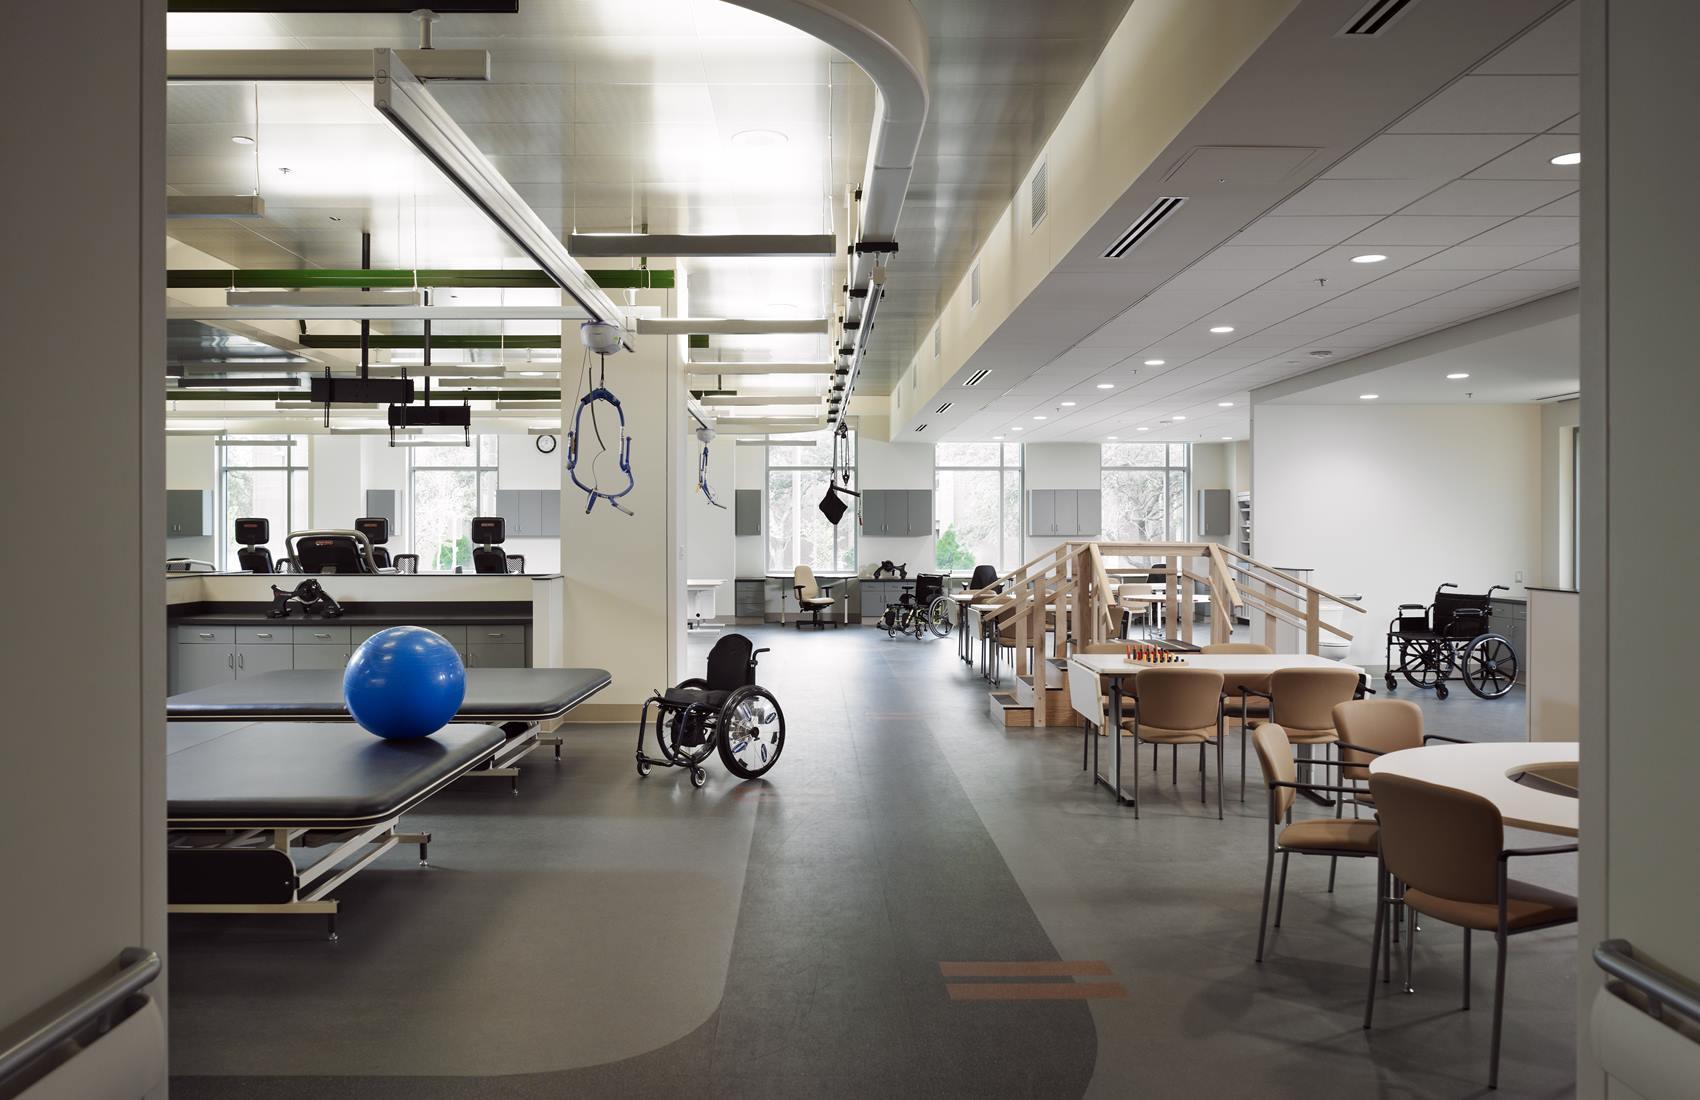 Polytrauma Rehab Center physical therapy room